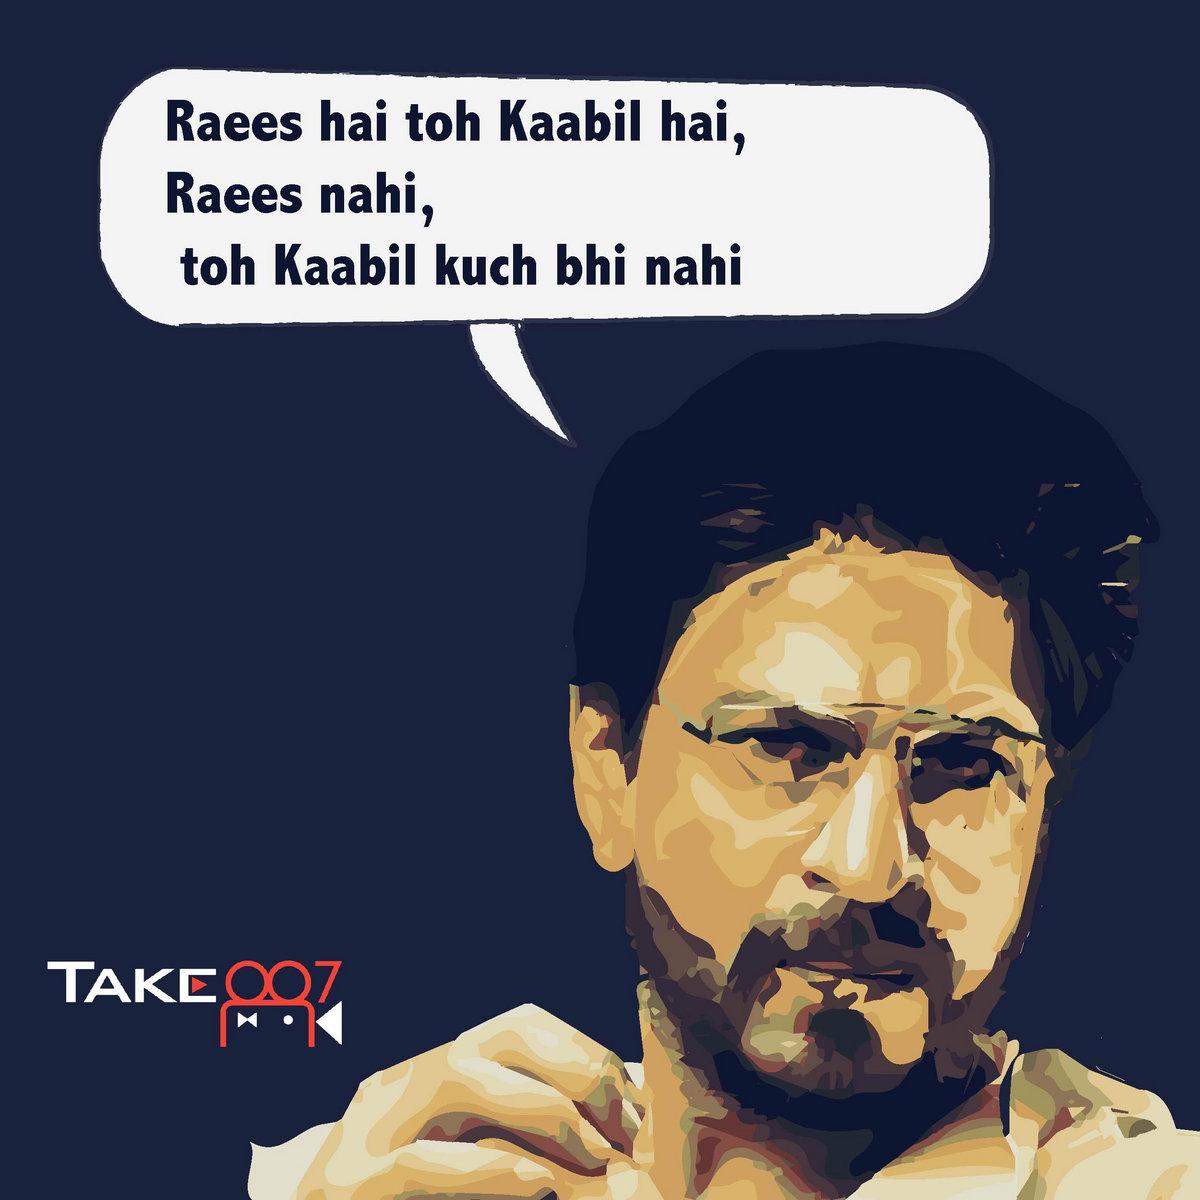 Free Download Ek Ladka Ek Ladki In Hindi | trananhapnua